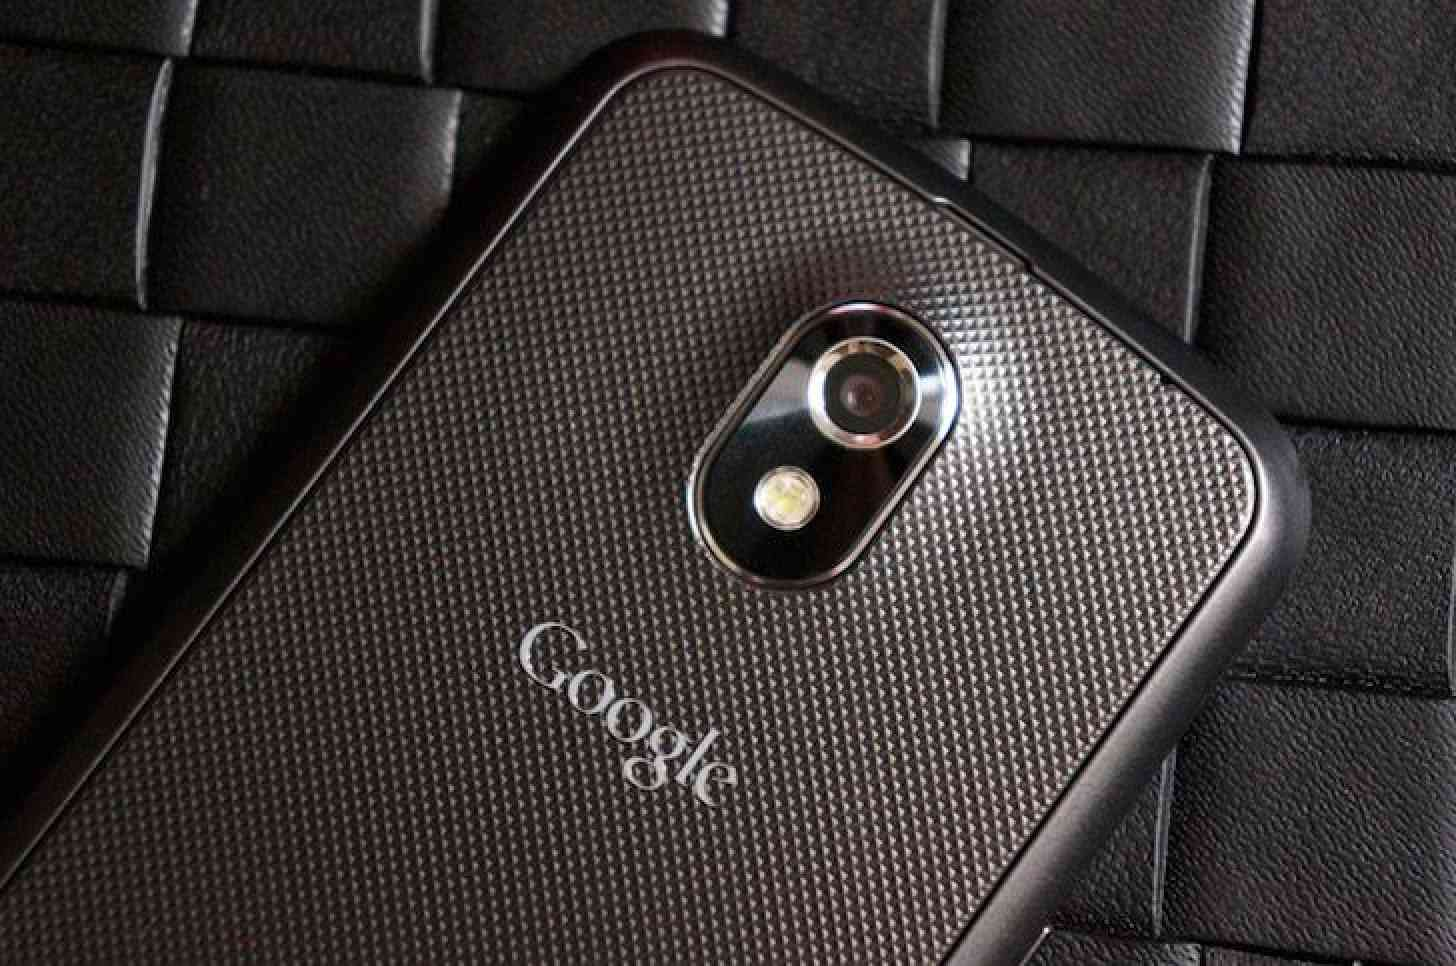 Google logo Samsung Galaxy Nexus rear